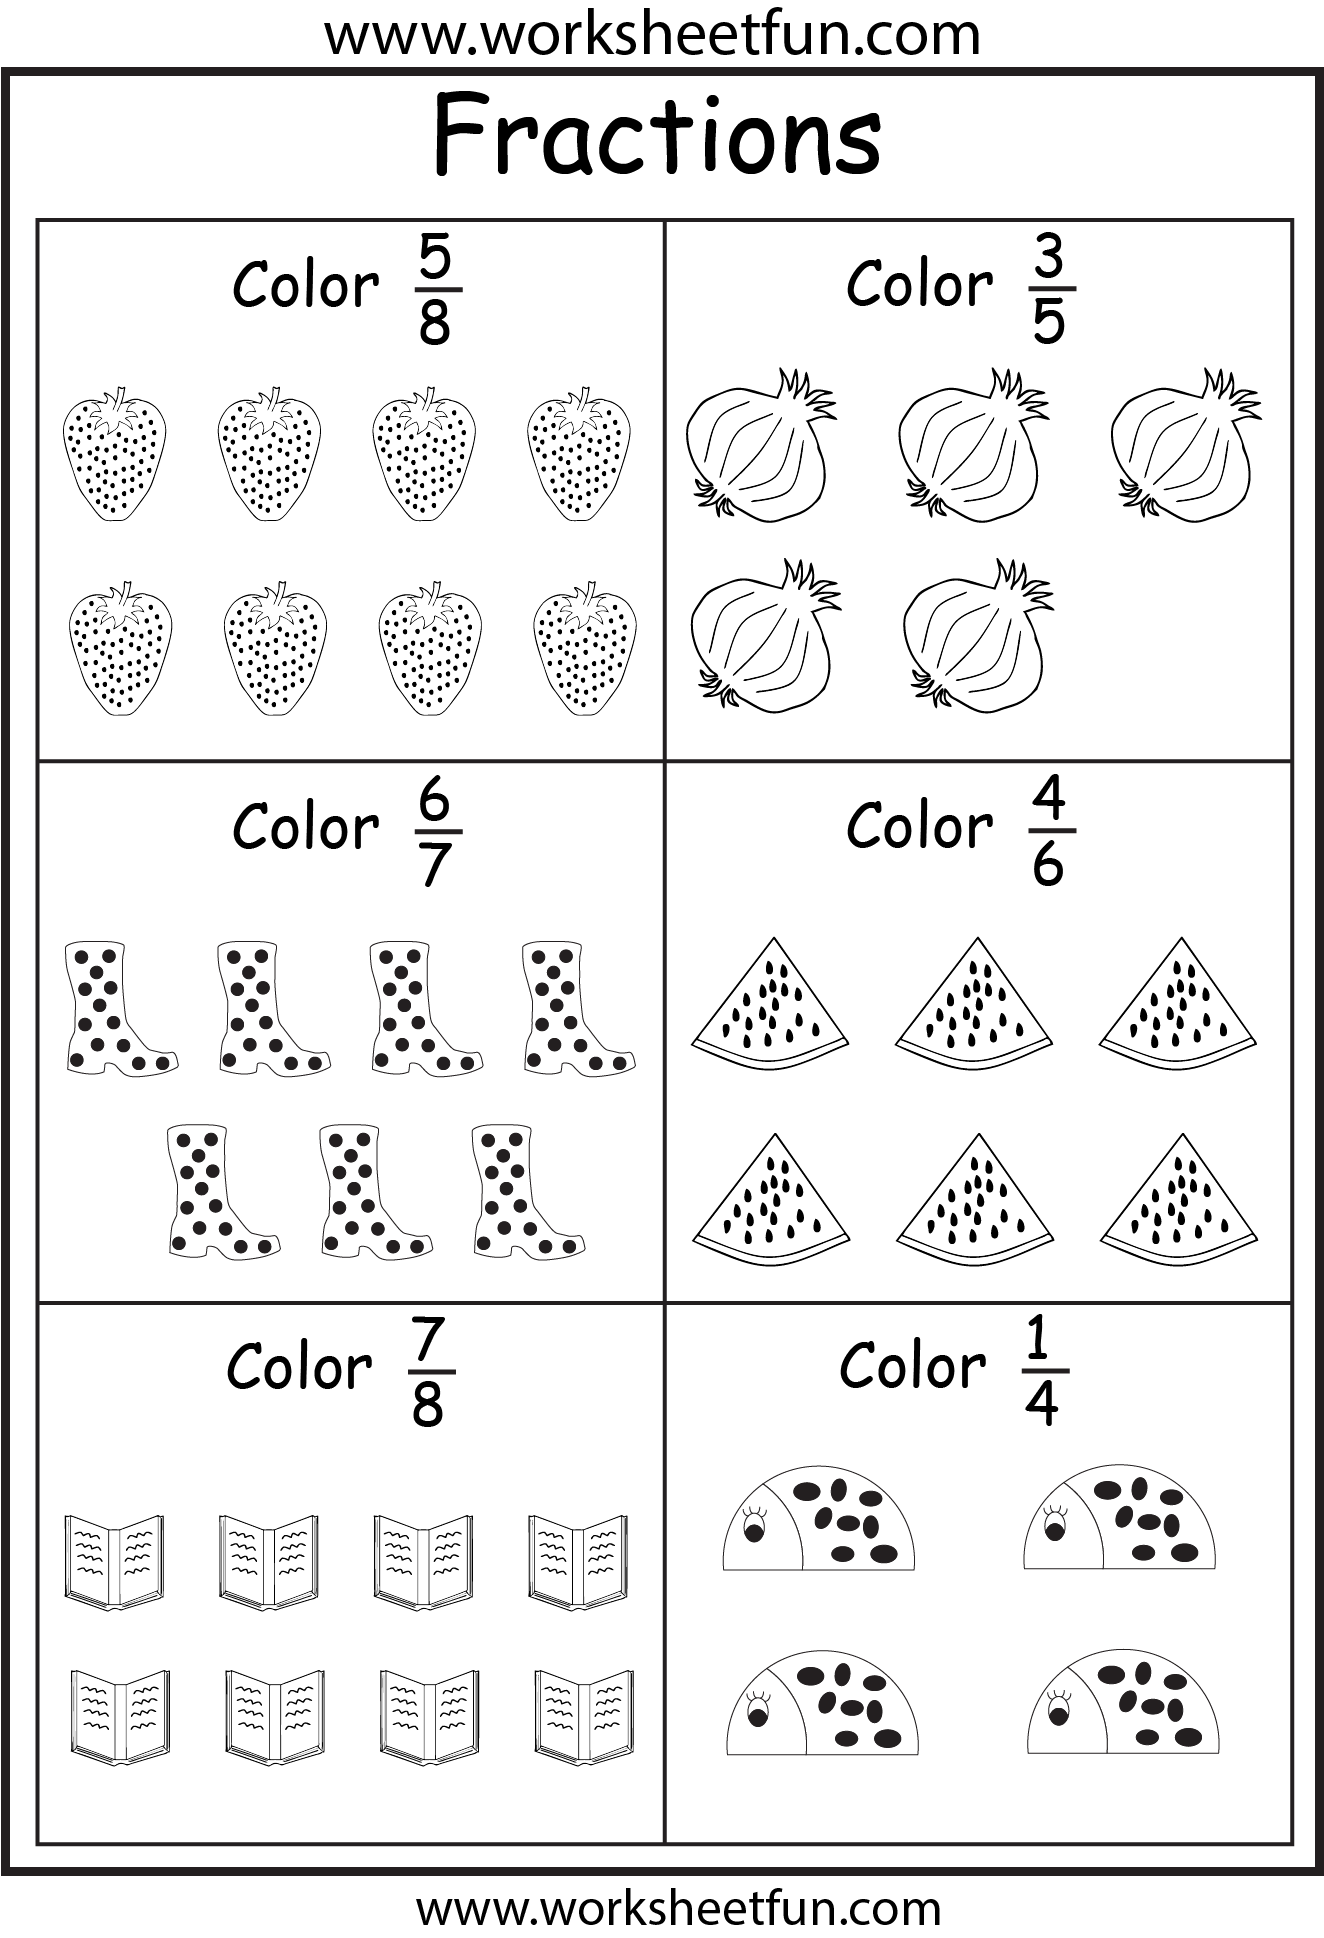 Coloring Fractions – 5 Worksheets   Fractions worksheets [ 1938 x 1324 Pixel ]